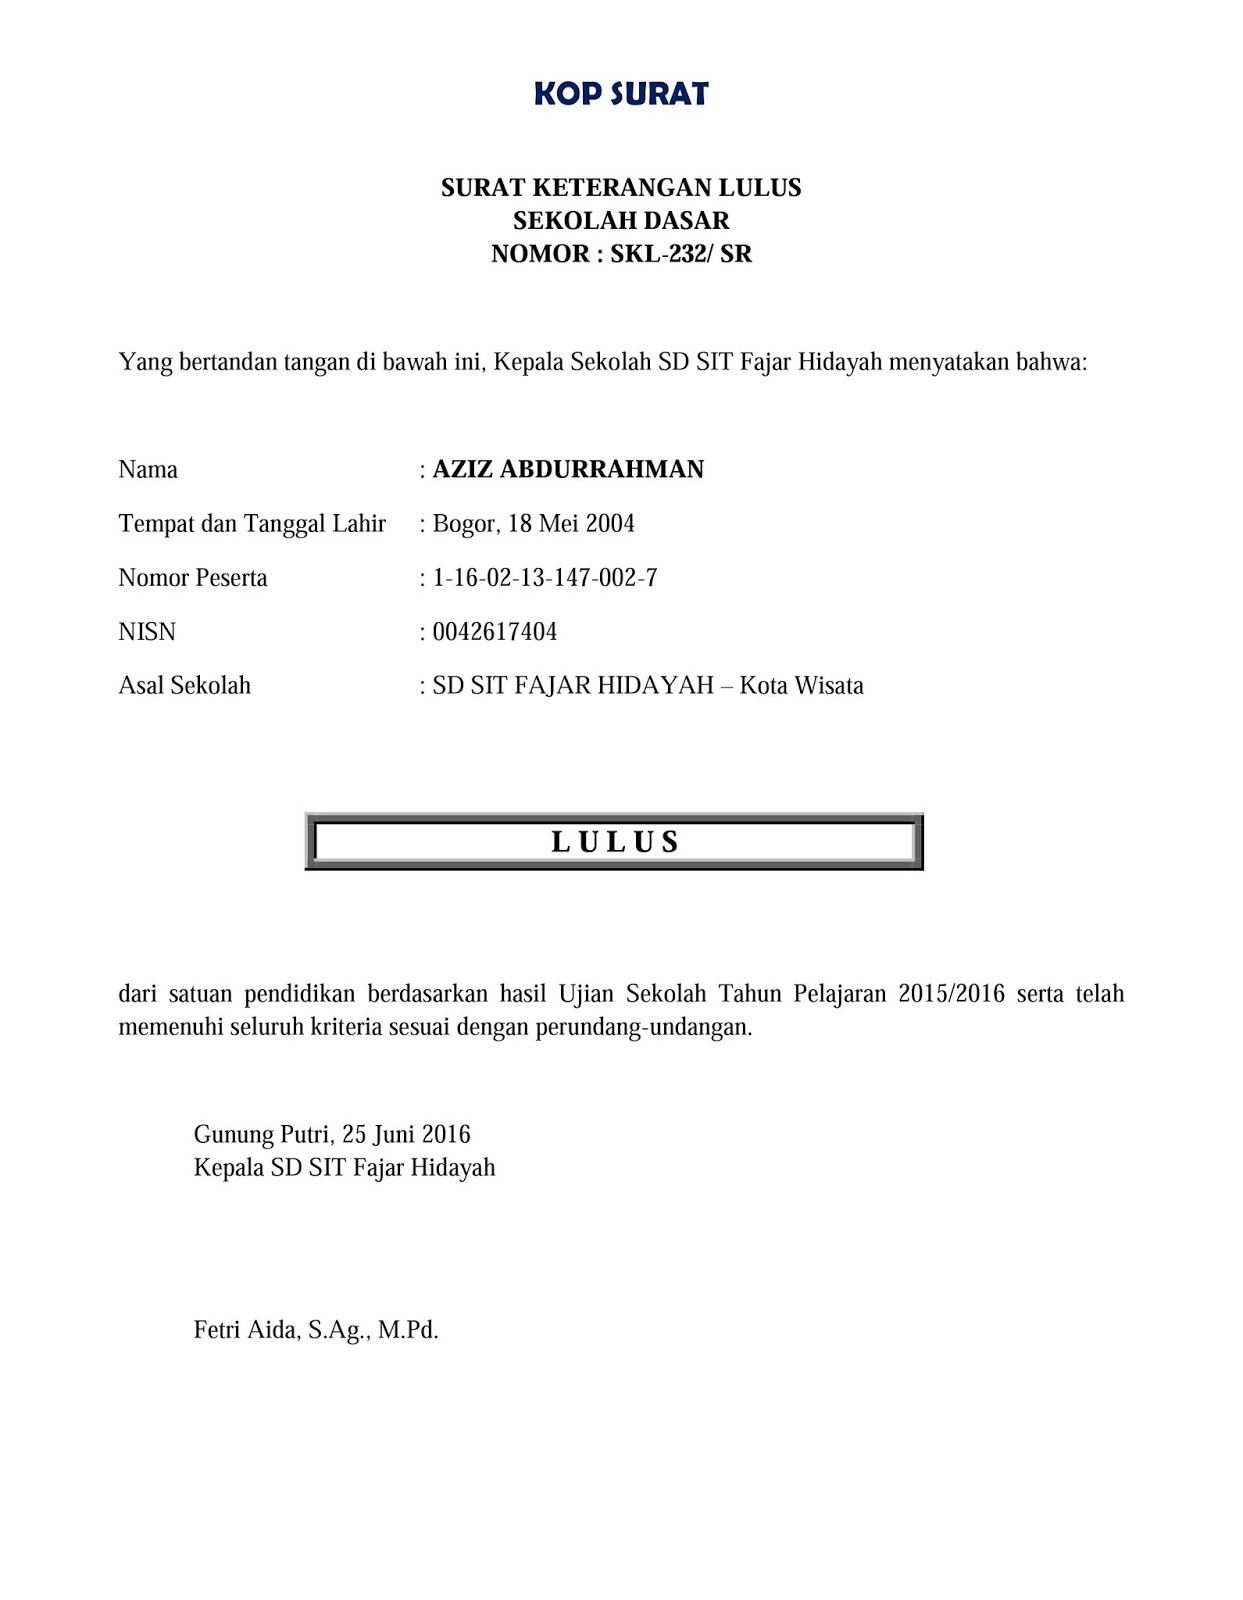 Contoh Surat Keterangan Lulus Sekolah Dasar Sd Folder